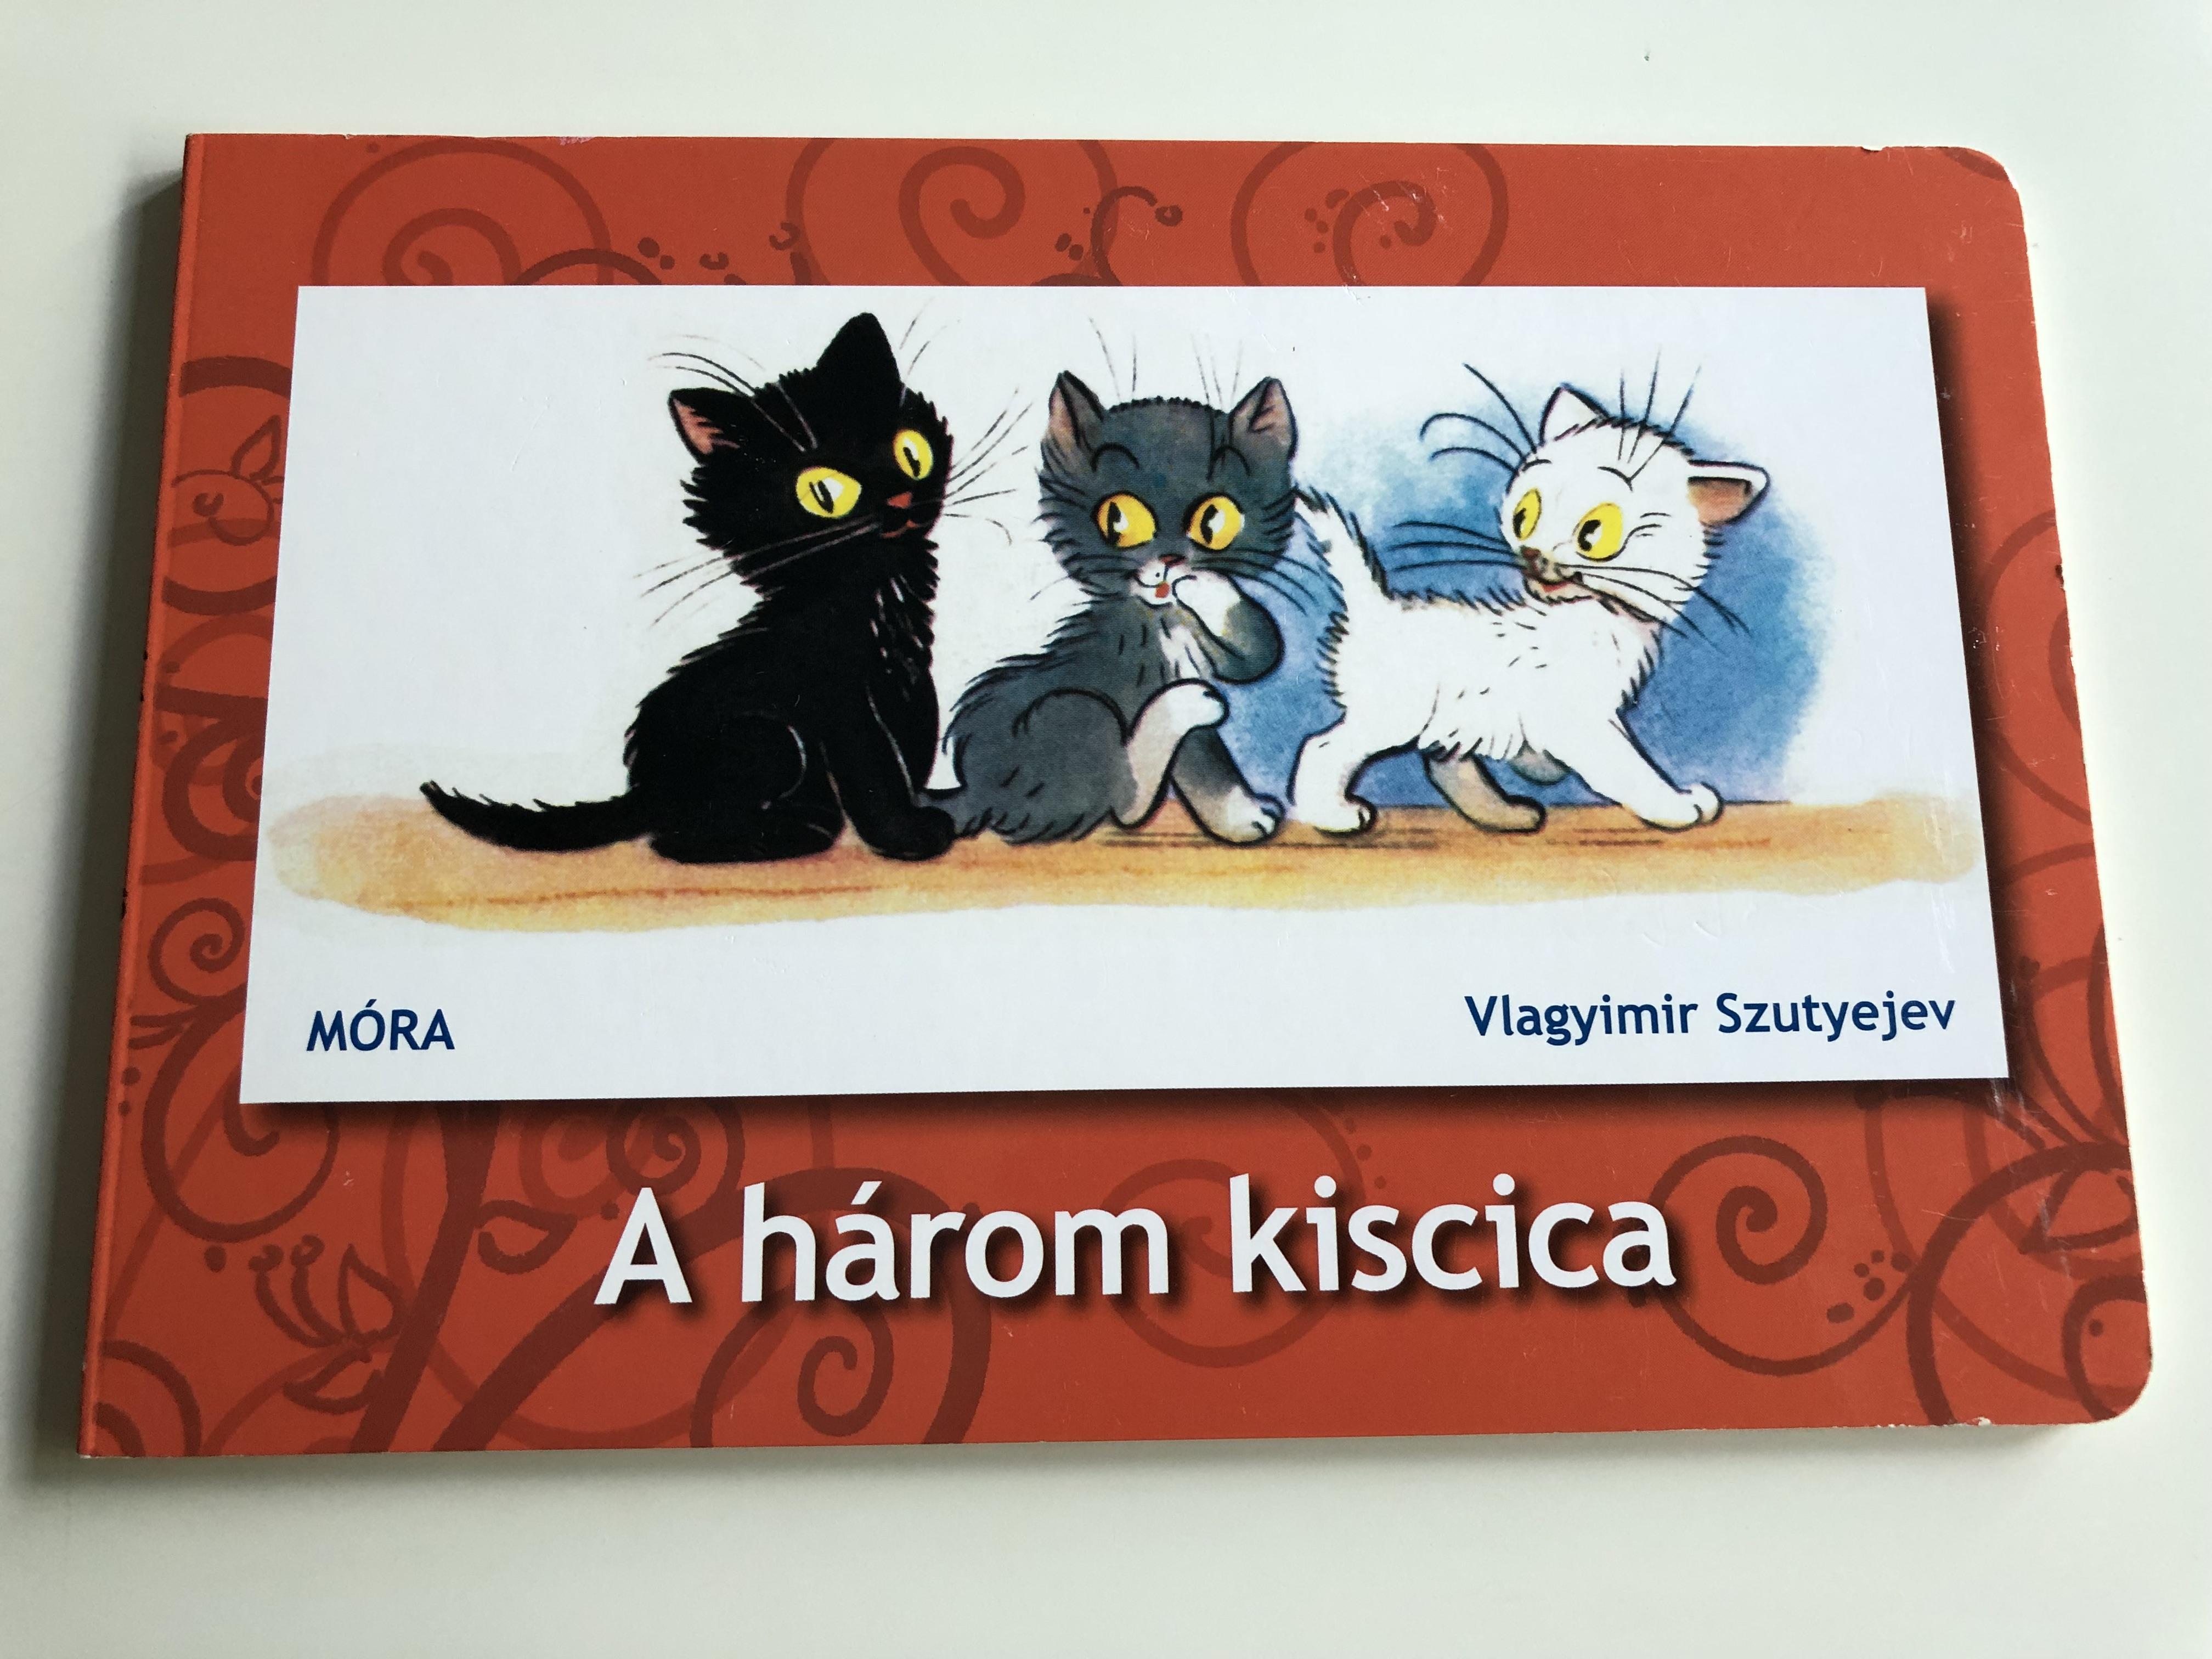 a-h-rom-kiscica-by-vlagyimir-szutyejev-hungarian-language-board-book-about-three-cats-m-ra-k-nyvkiad-2016-1-.jpg